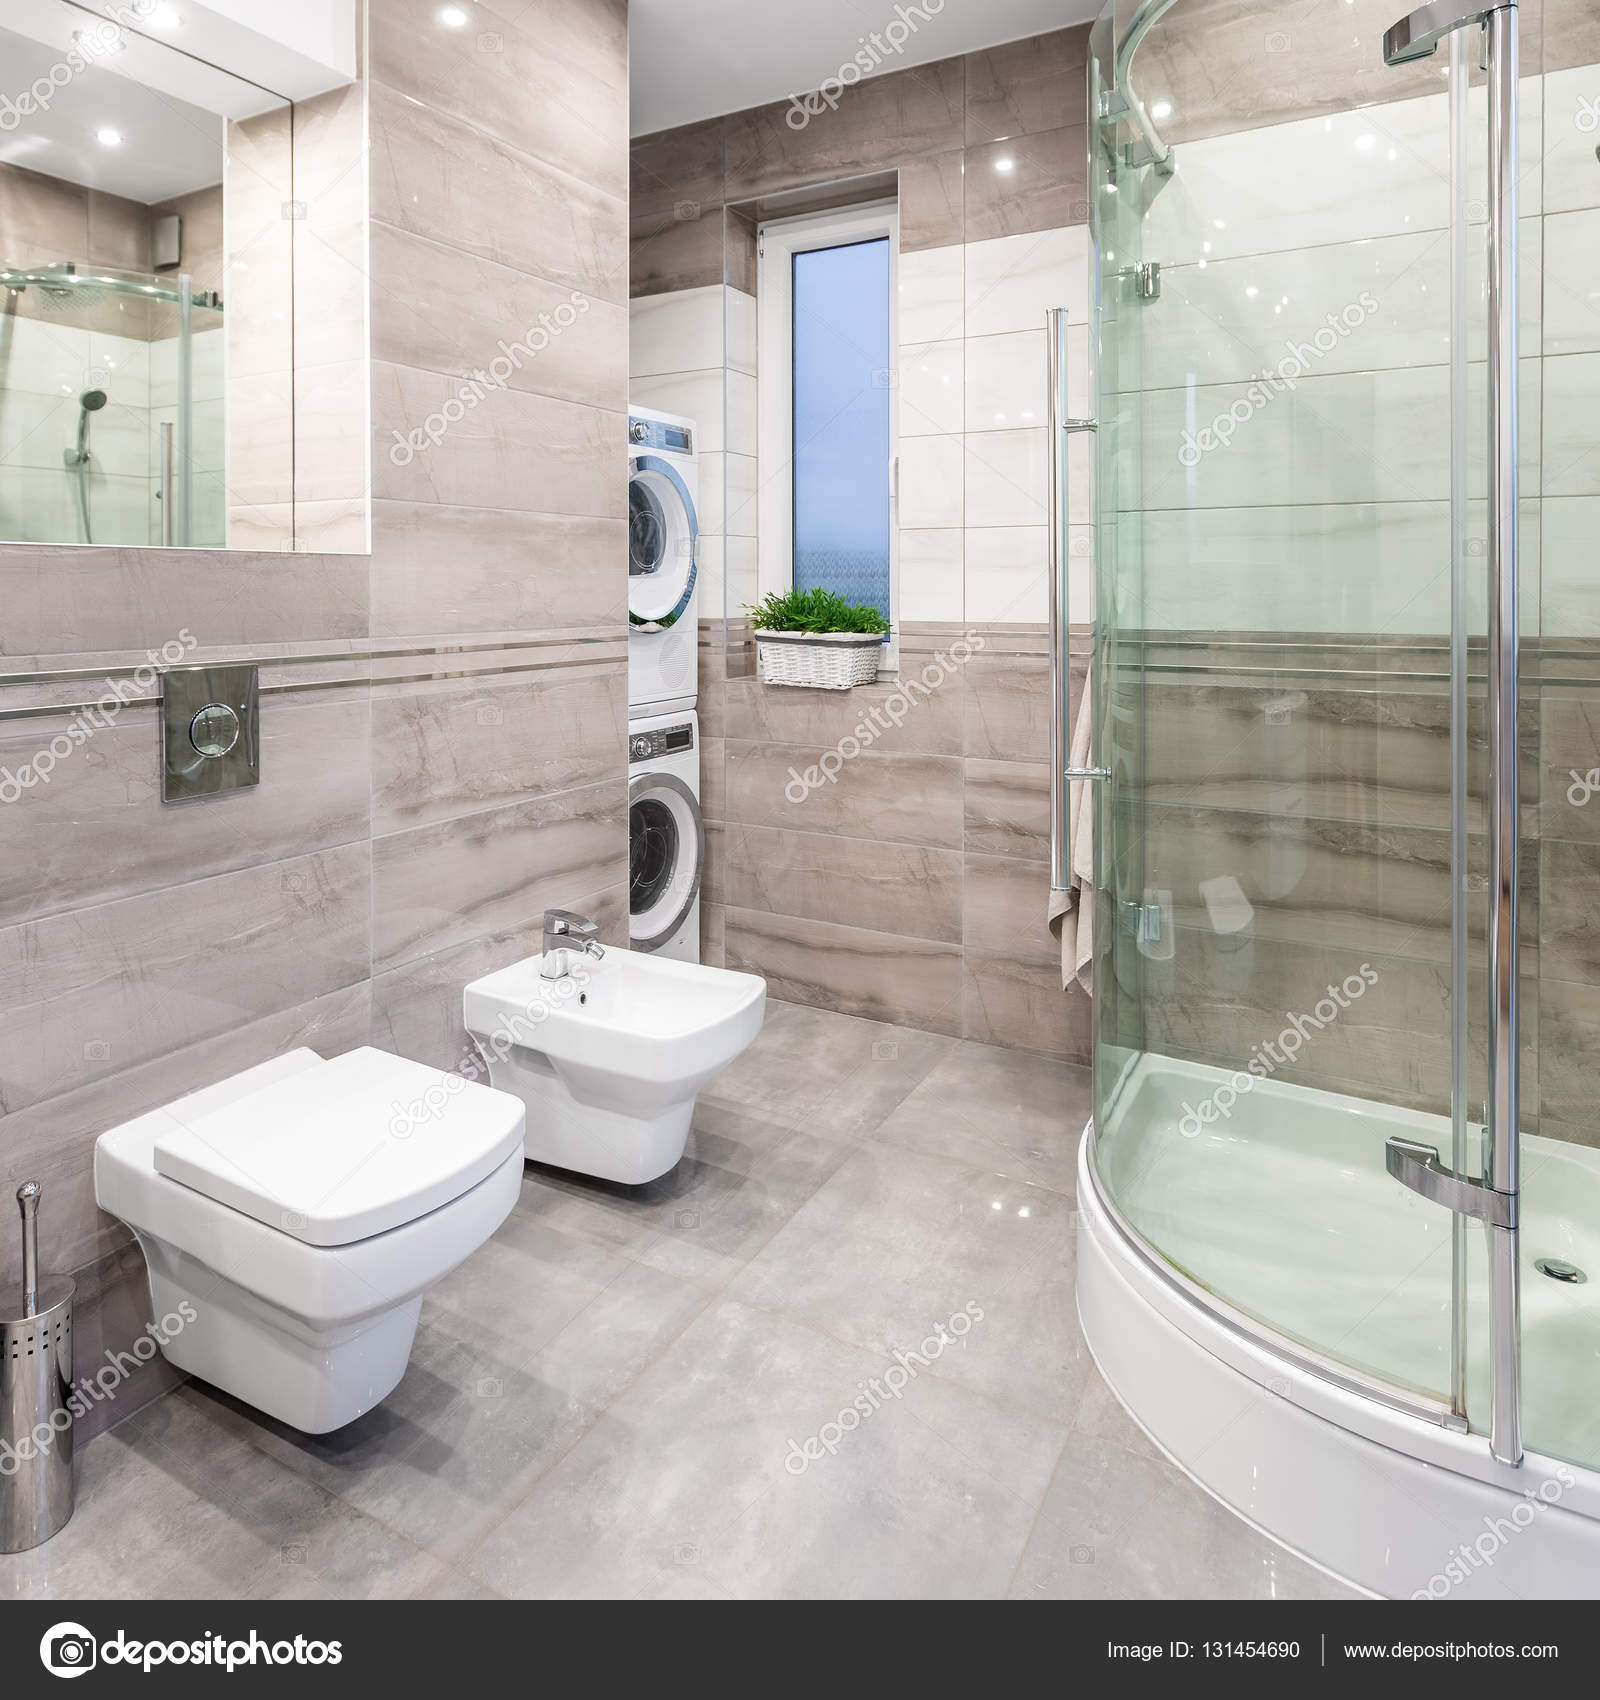 Hoogglans badkamer idee — Stockfoto © in4mal #131454690